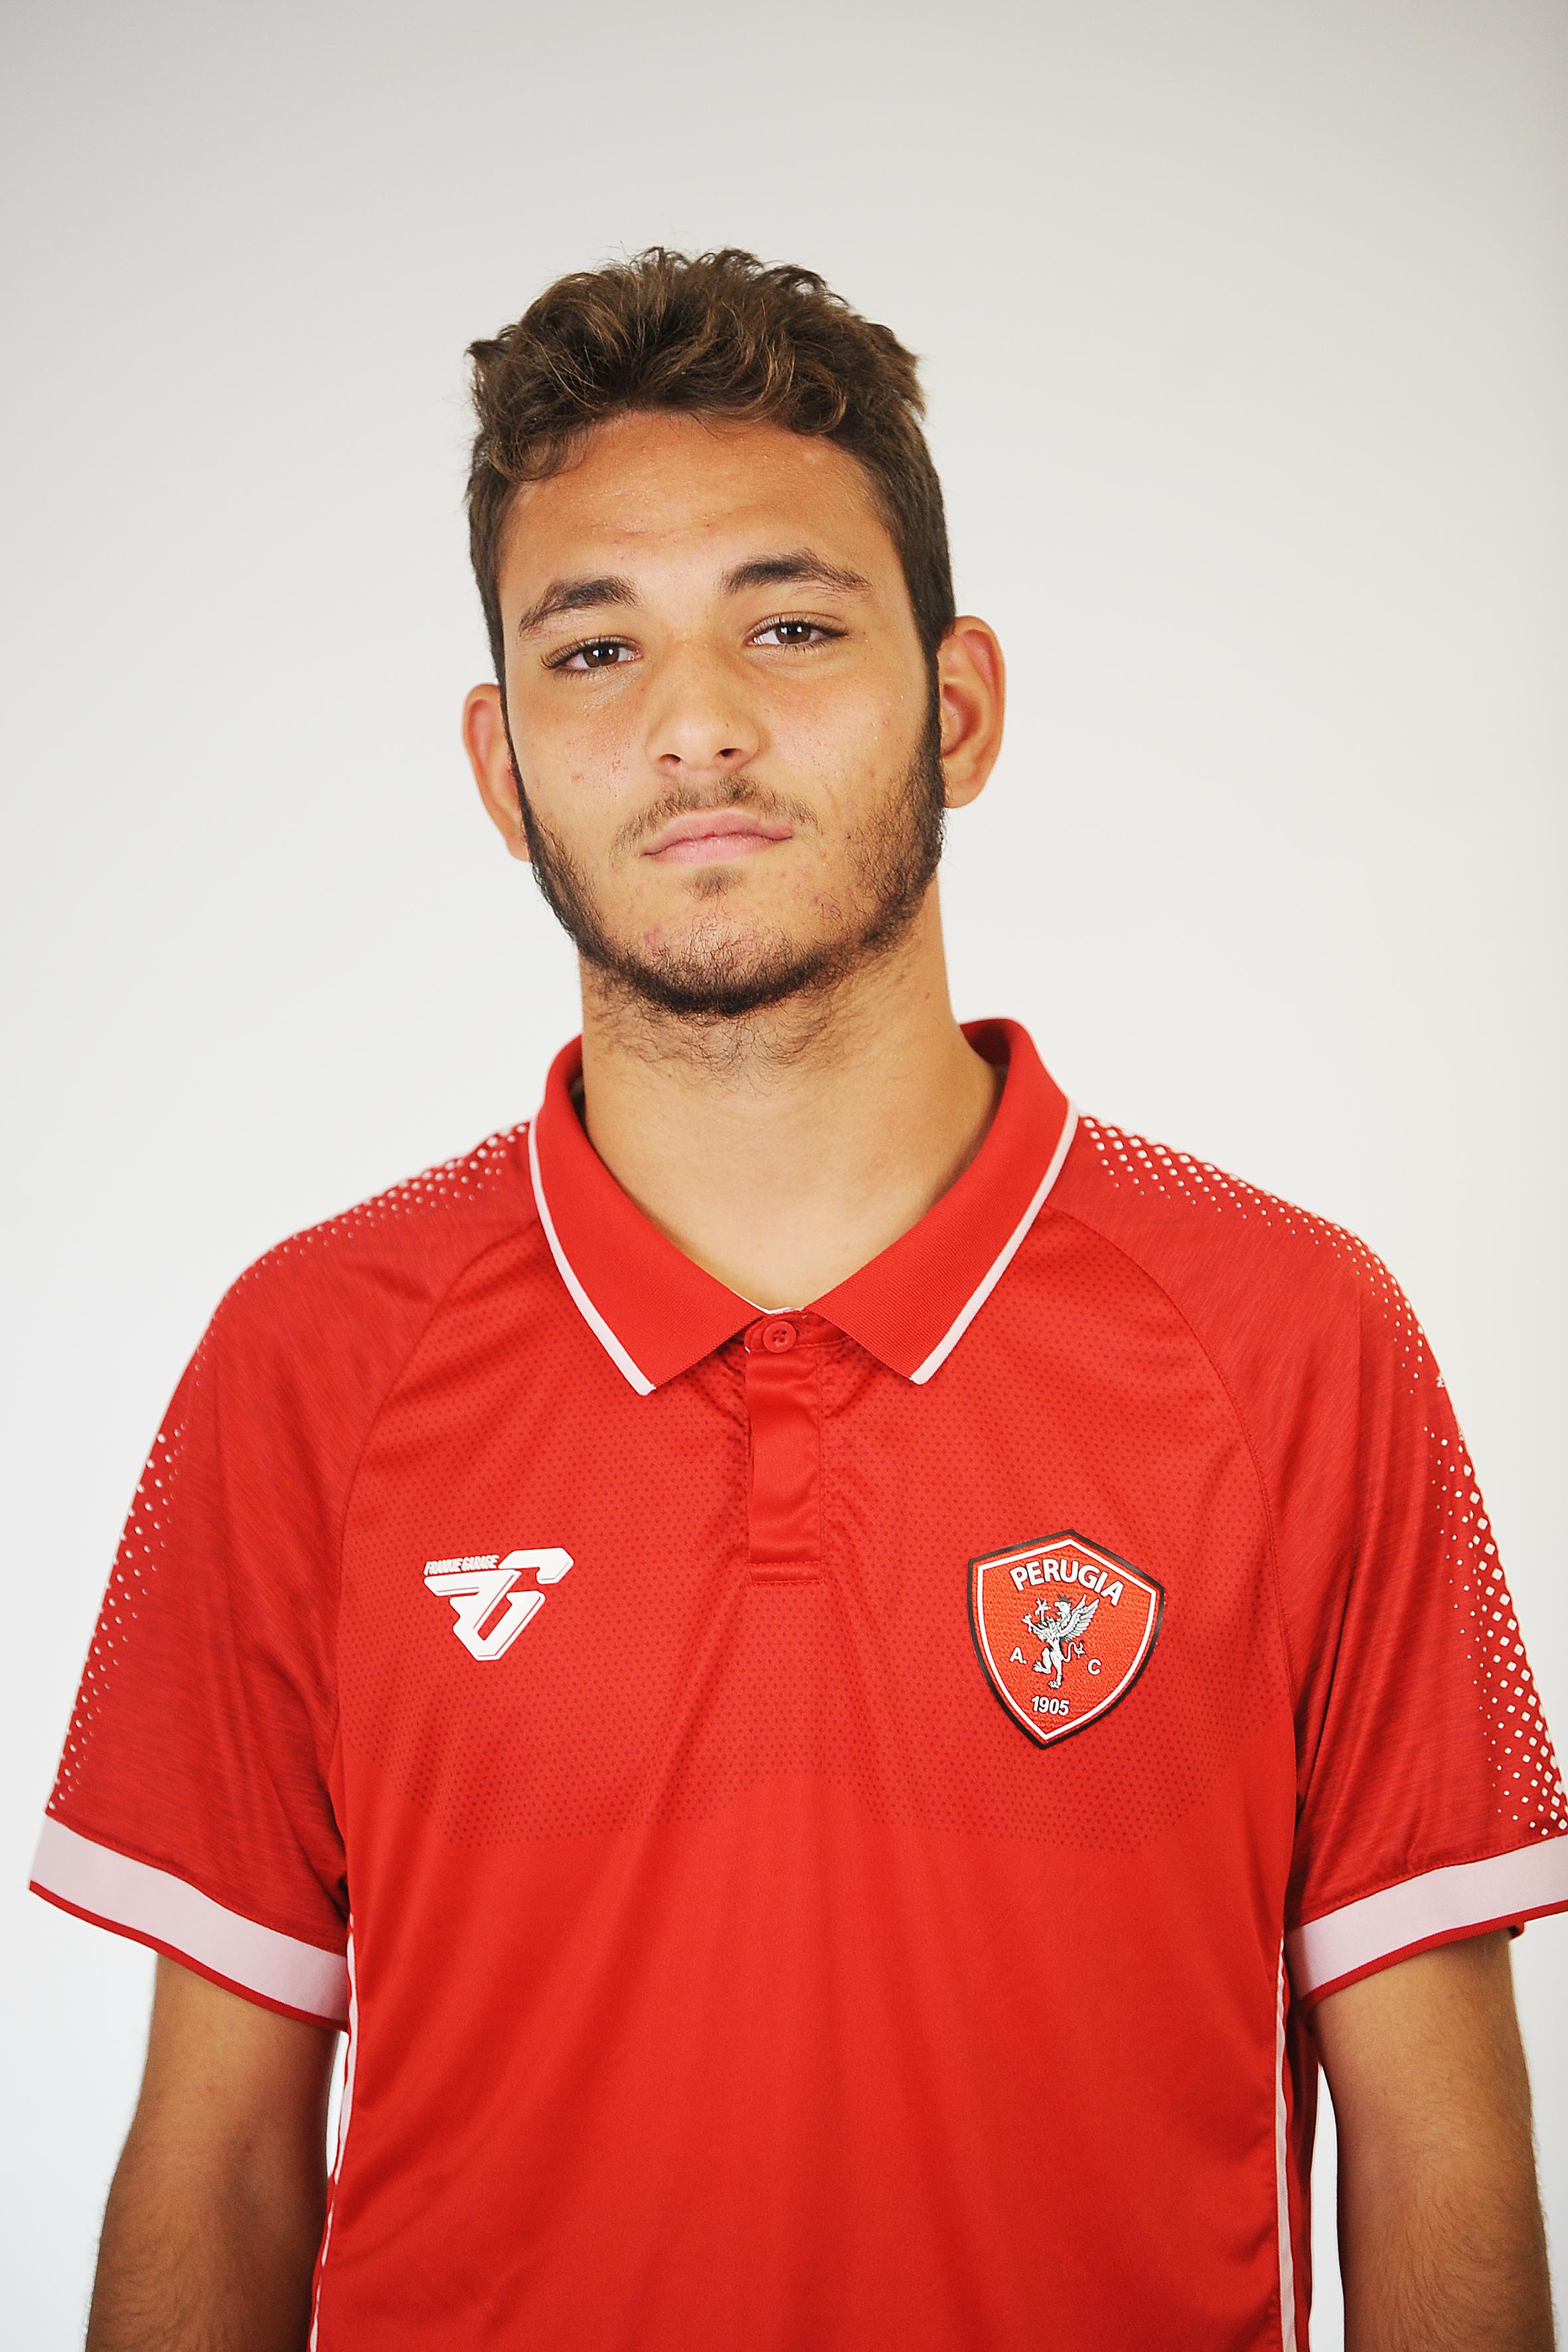 Gerardo SpinelliCentrocampista- A.C. Perugia Calcio